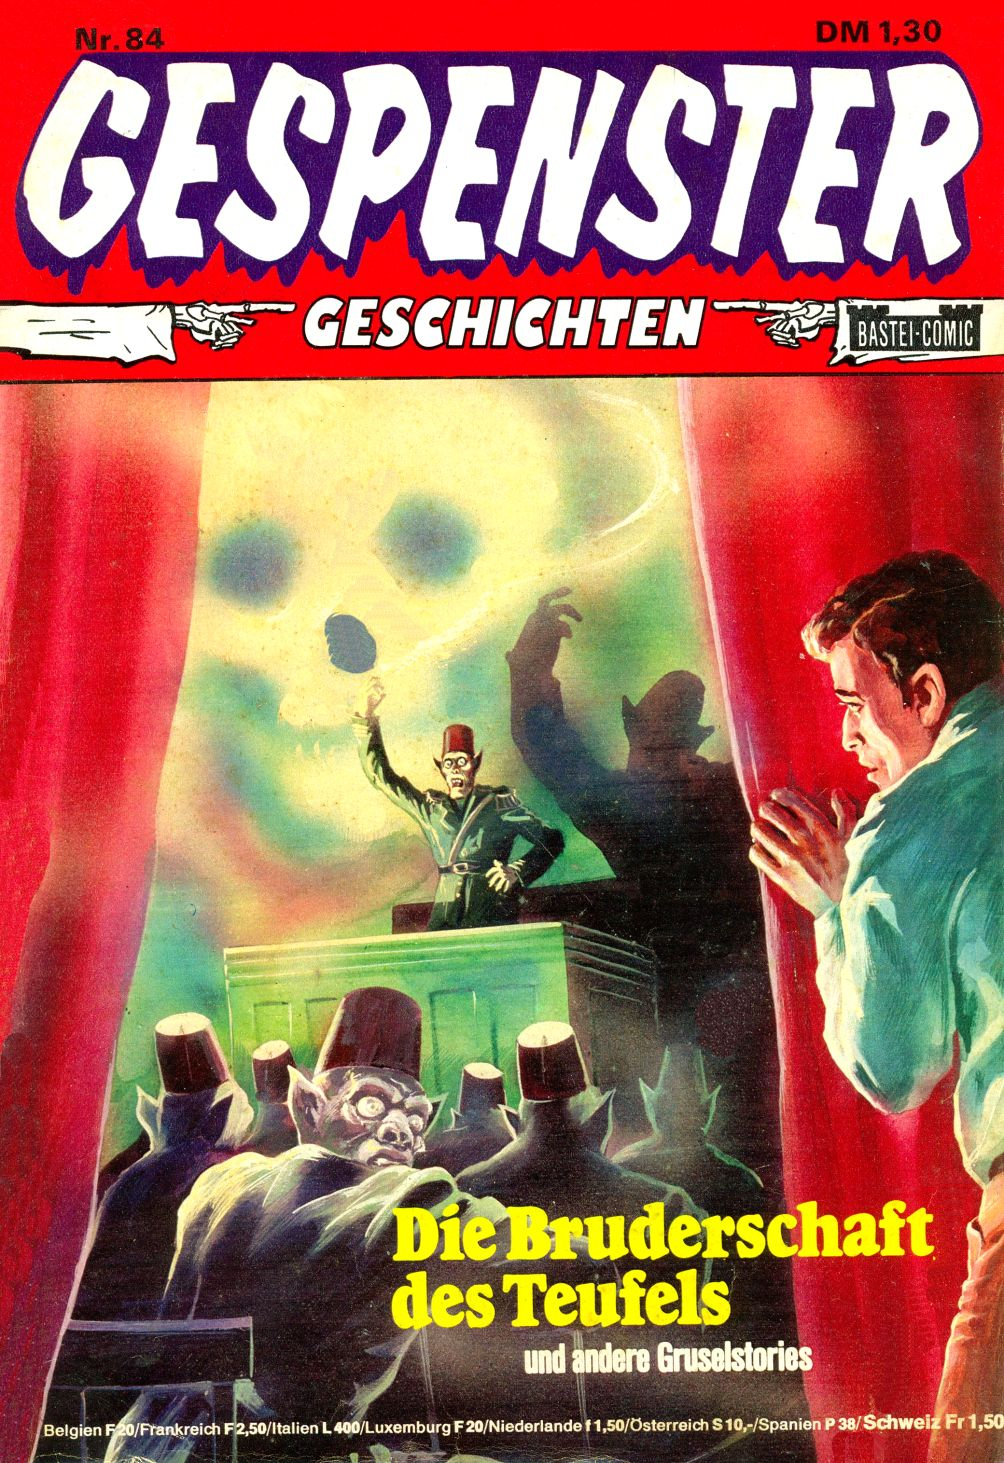 Gespenster Geschichten - 84